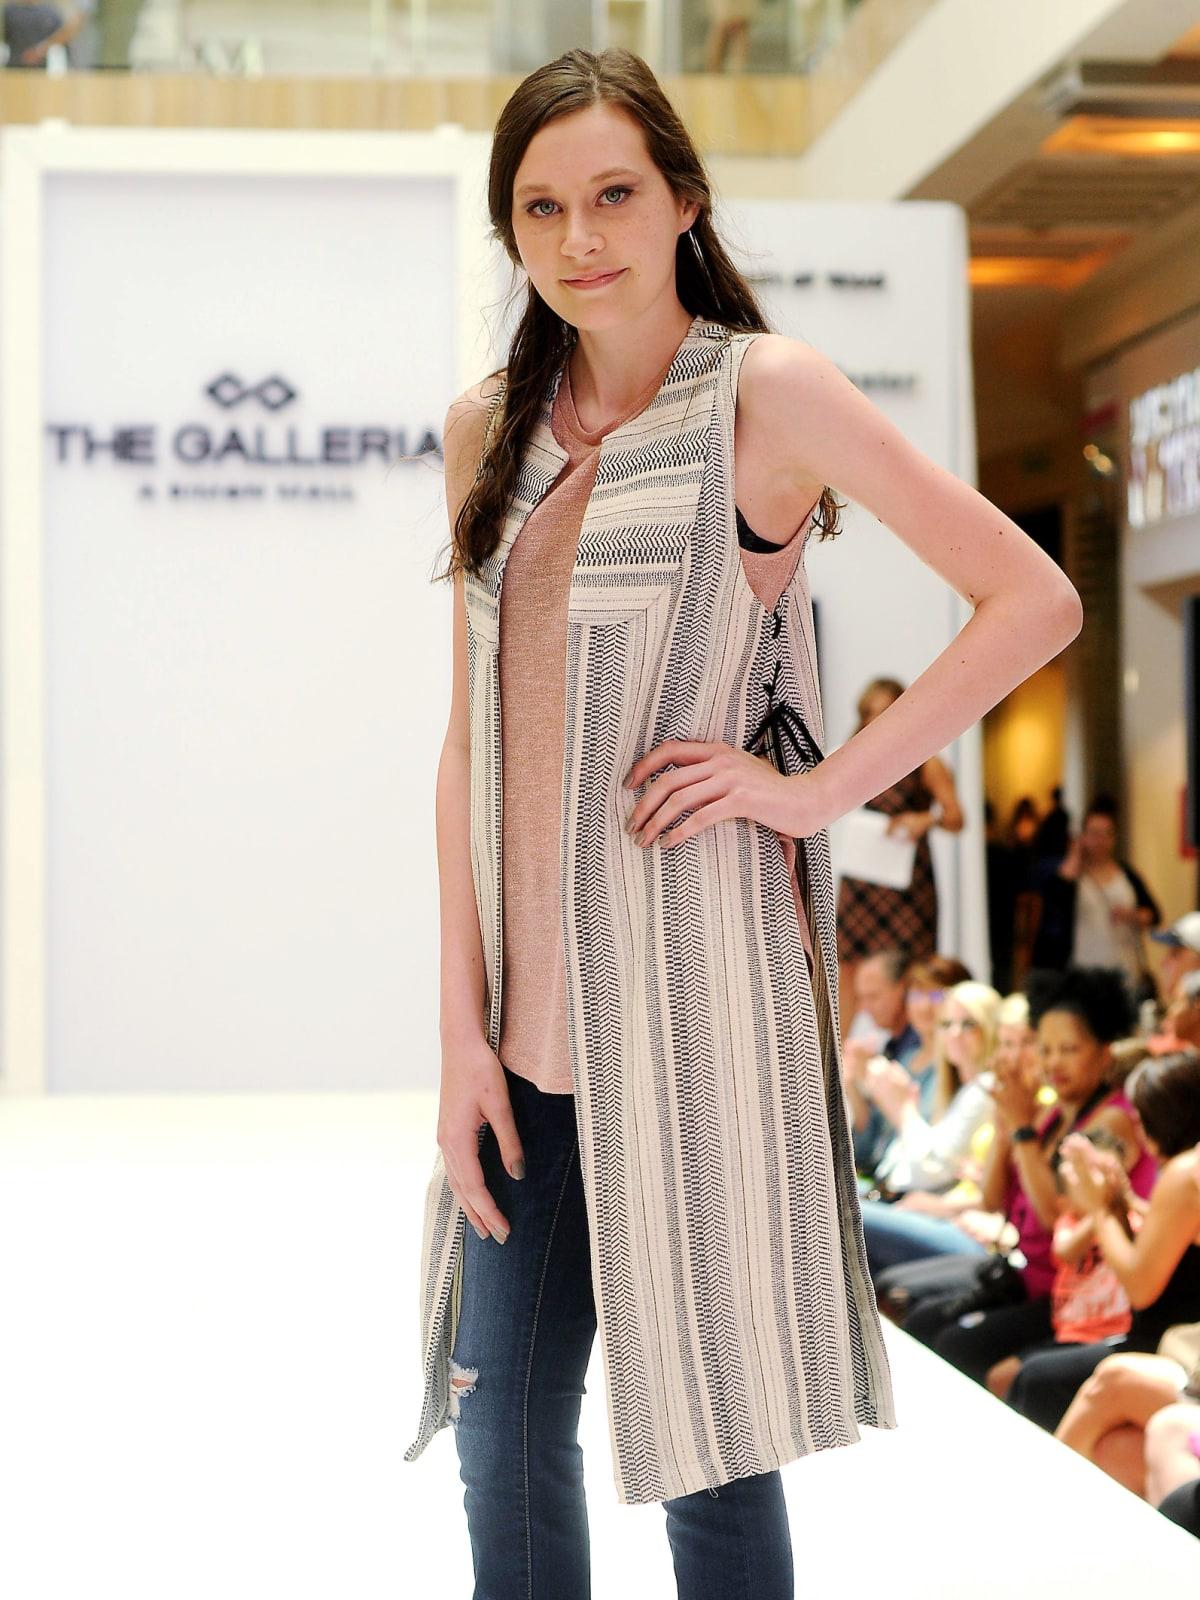 MD Anderson fashion show patient Sydney Kallus